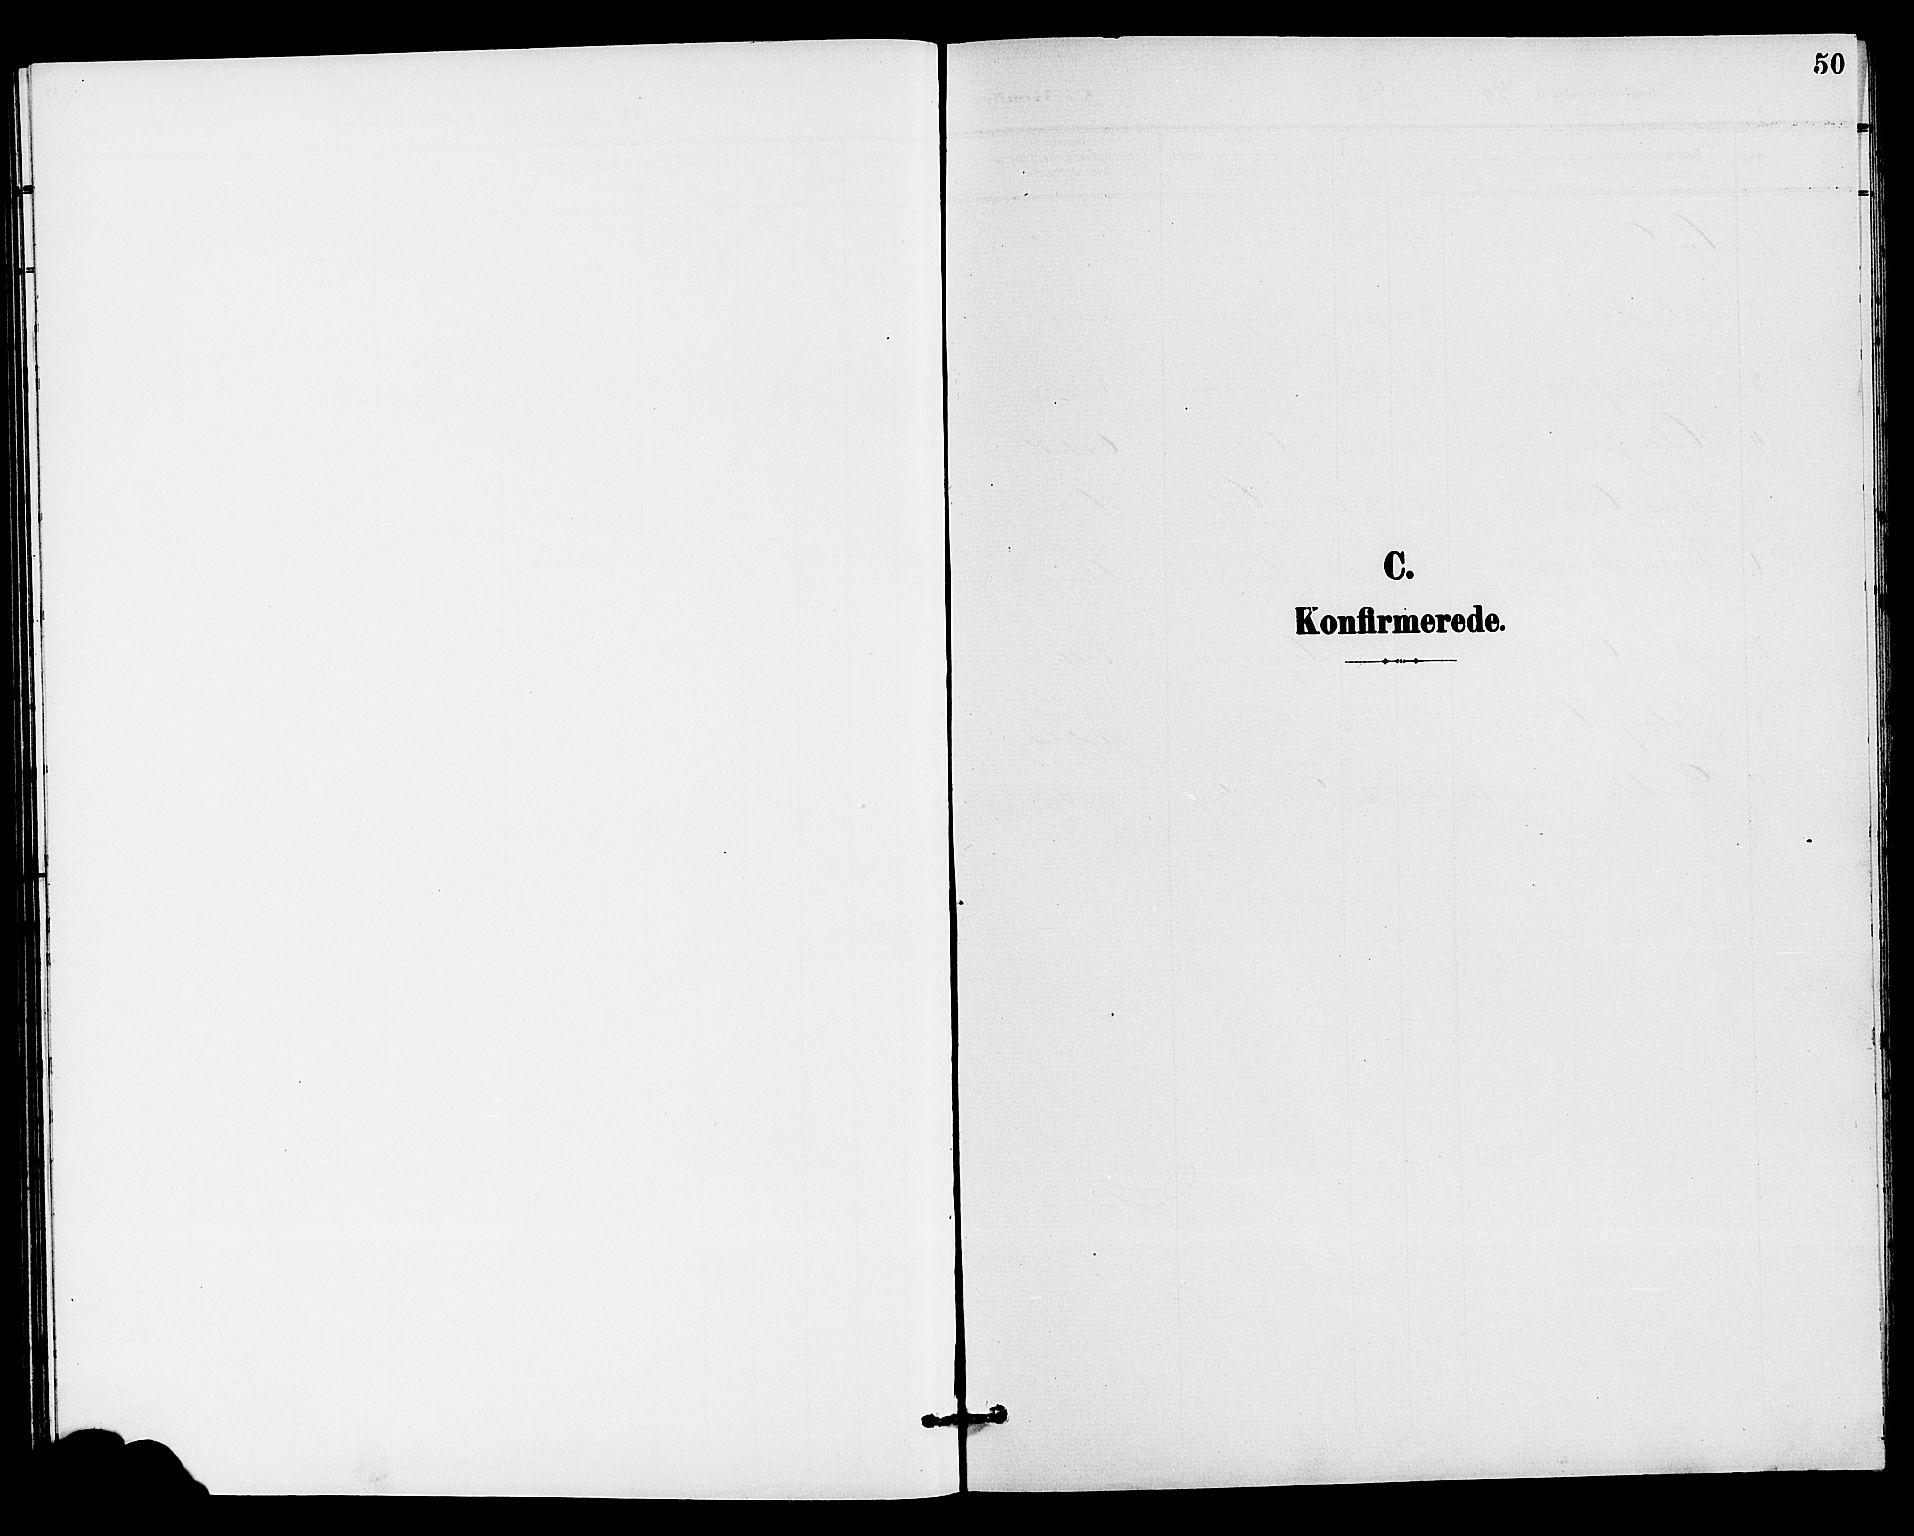 SAKO, Holla kirkebøker, G/Gb/L0002: Klokkerbok nr. II 2, 1897-1913, s. 50